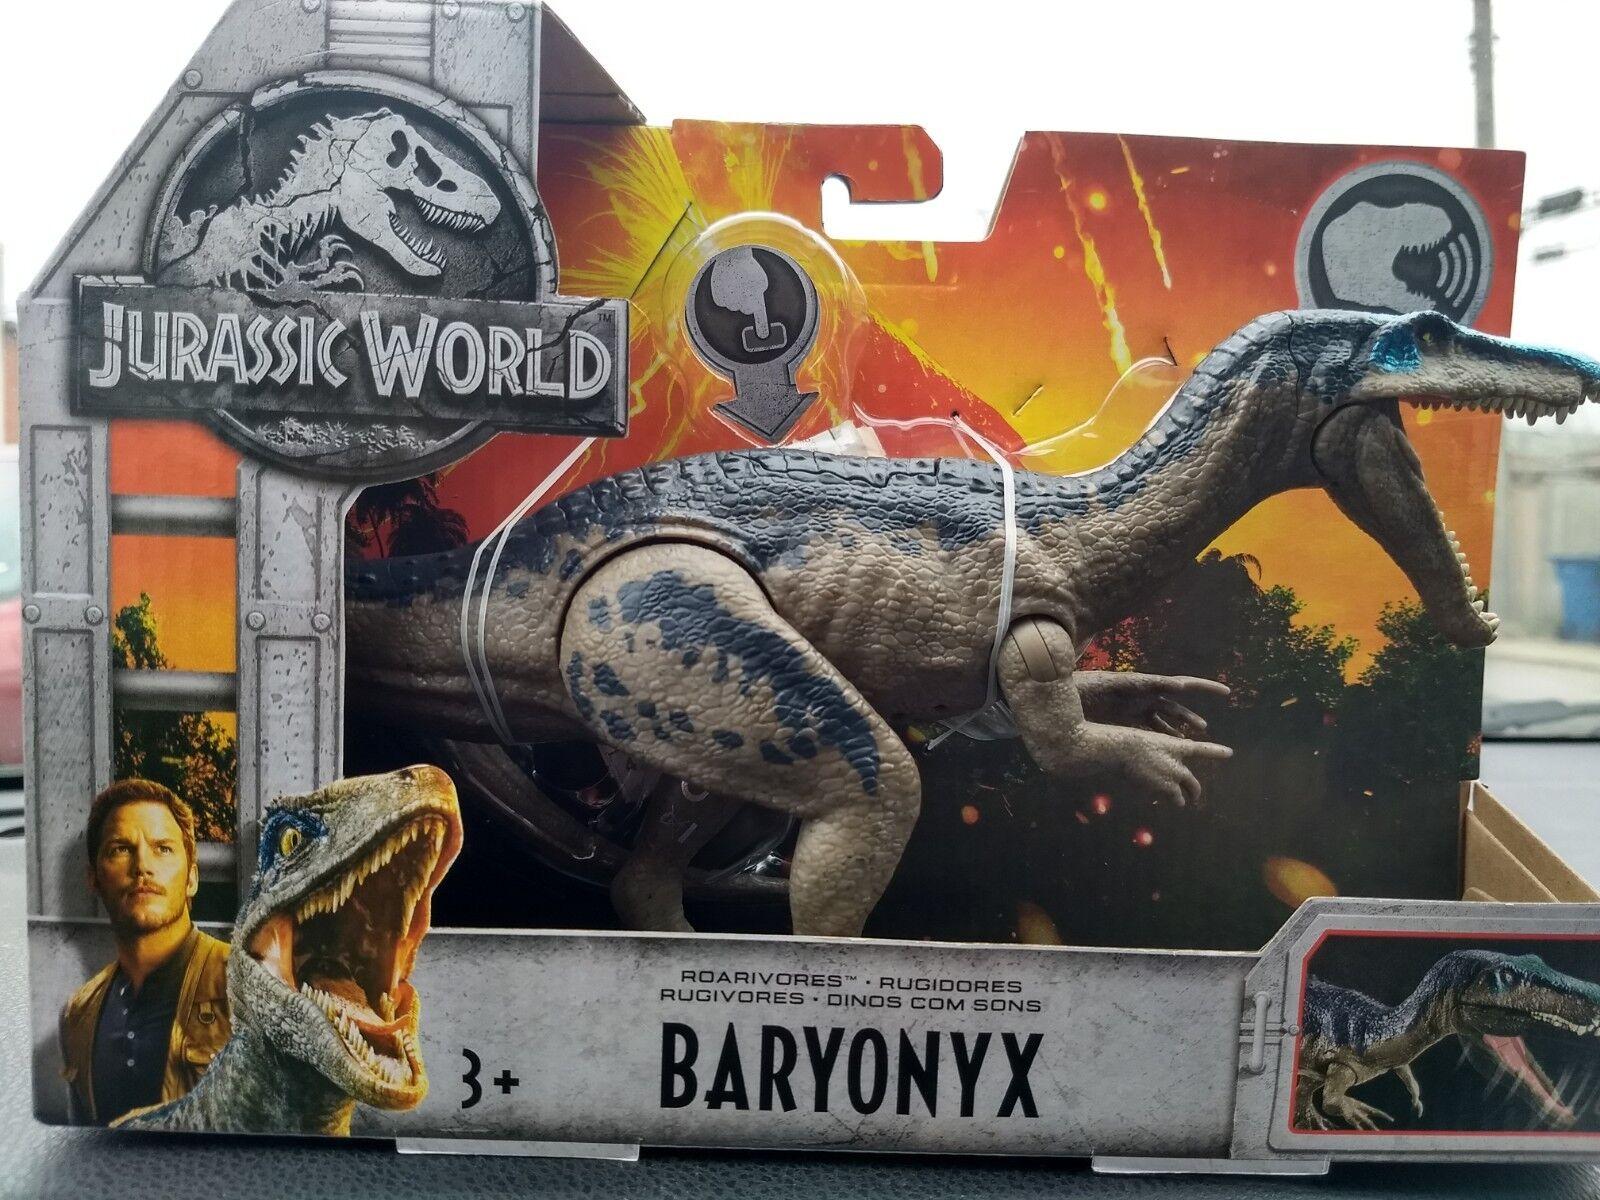 Jurassic World Fallen Kingdom BARYONYX, Roarivore New Mattel toy